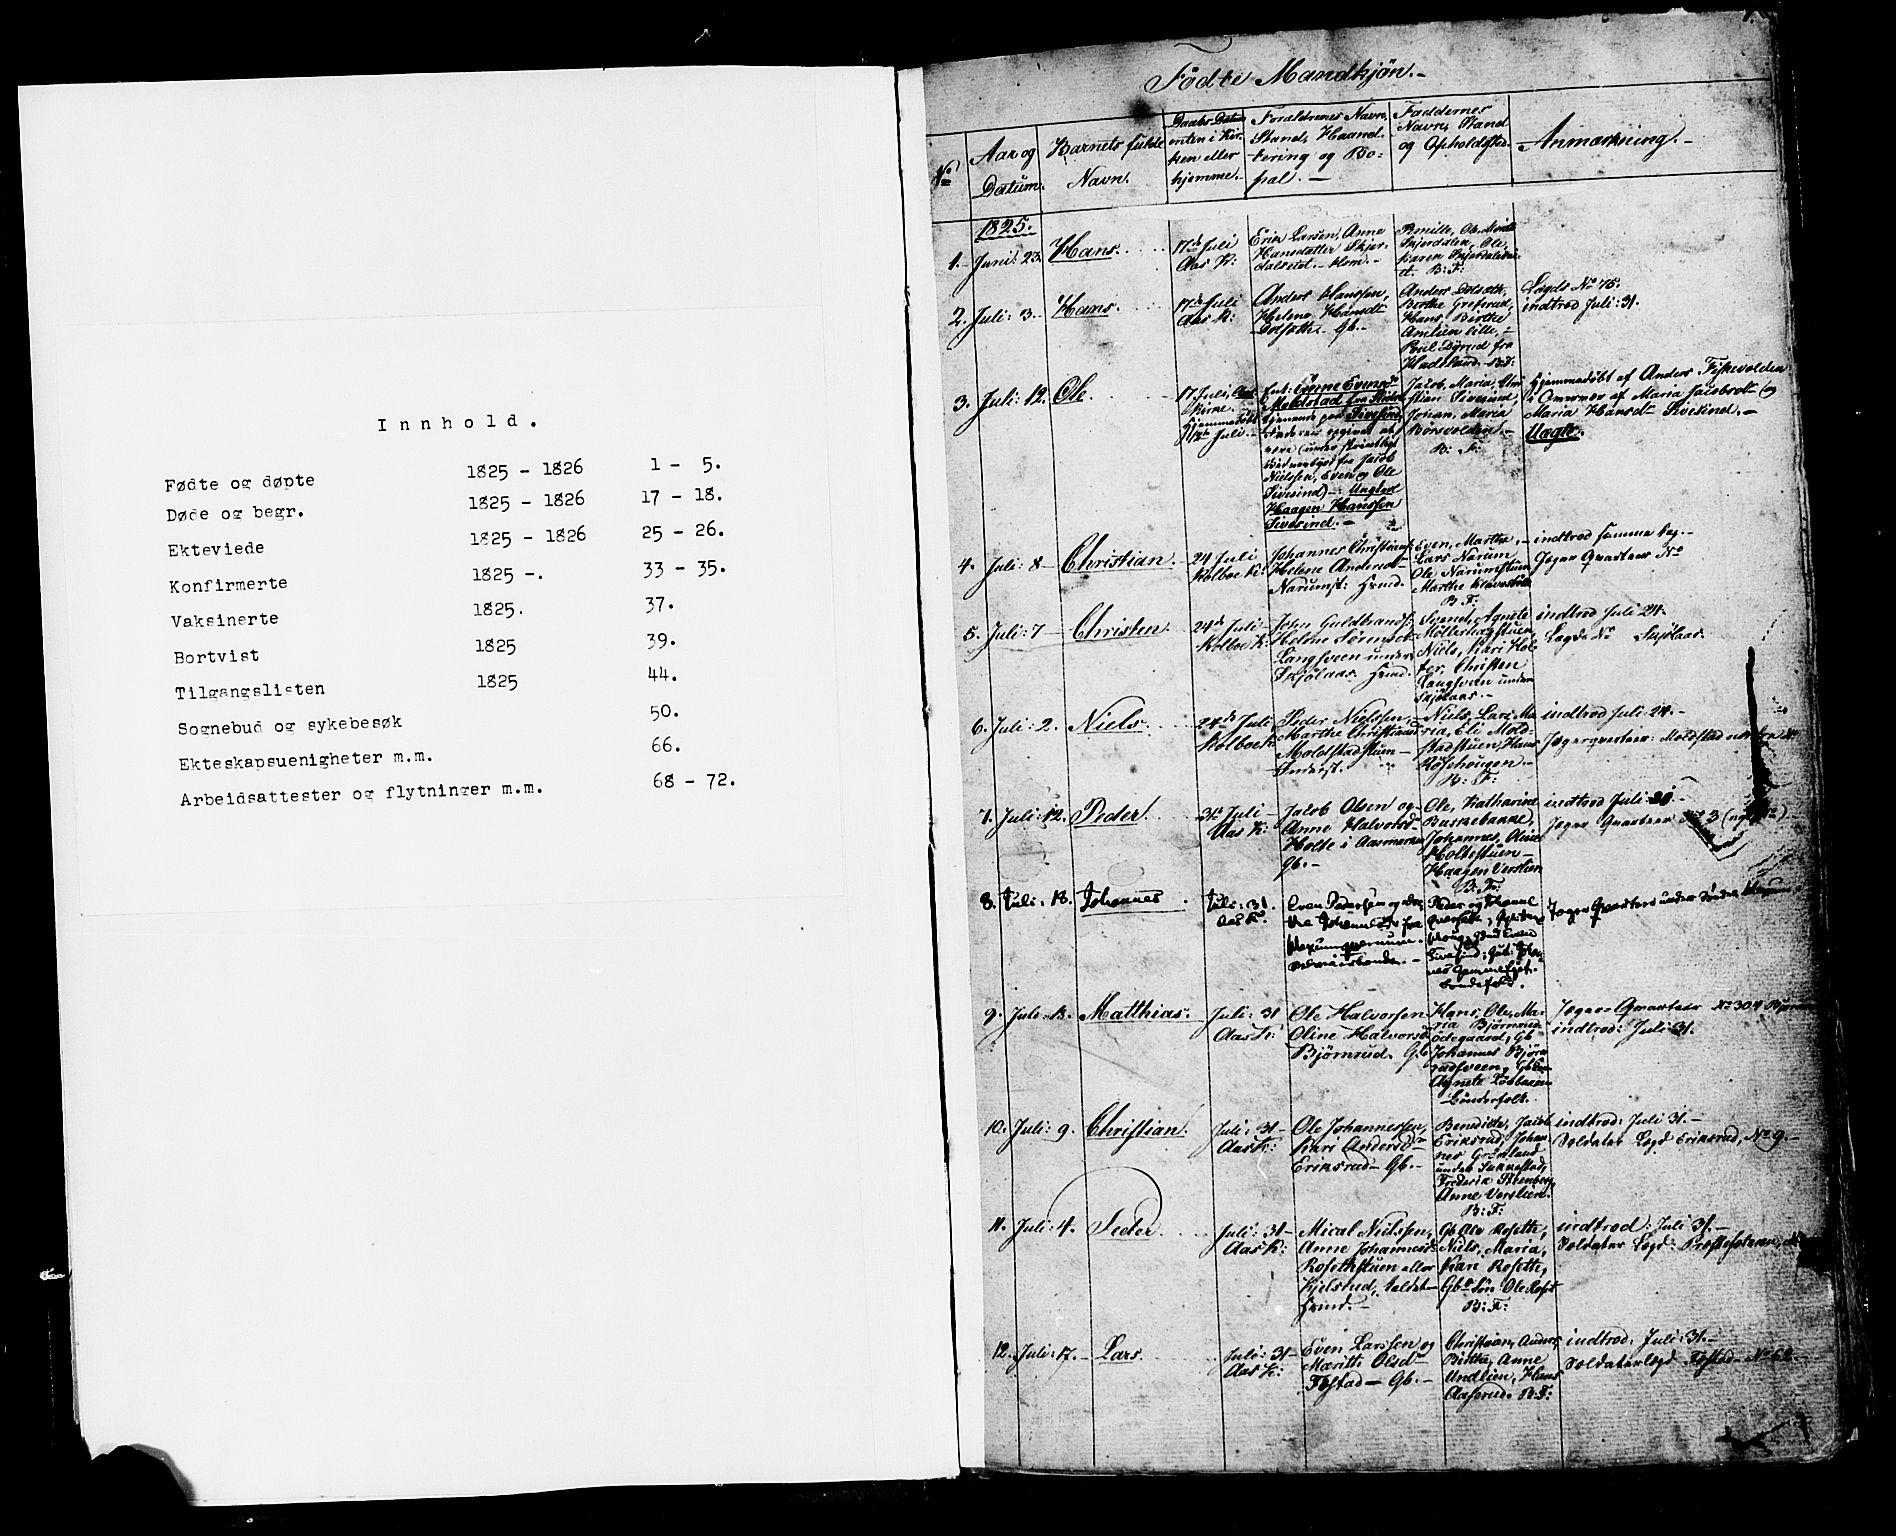 SAH, Vestre Toten prestekontor, H/Ha/Haa/L0001: Ministerialbok nr. 1, 1825-1826, s. 1